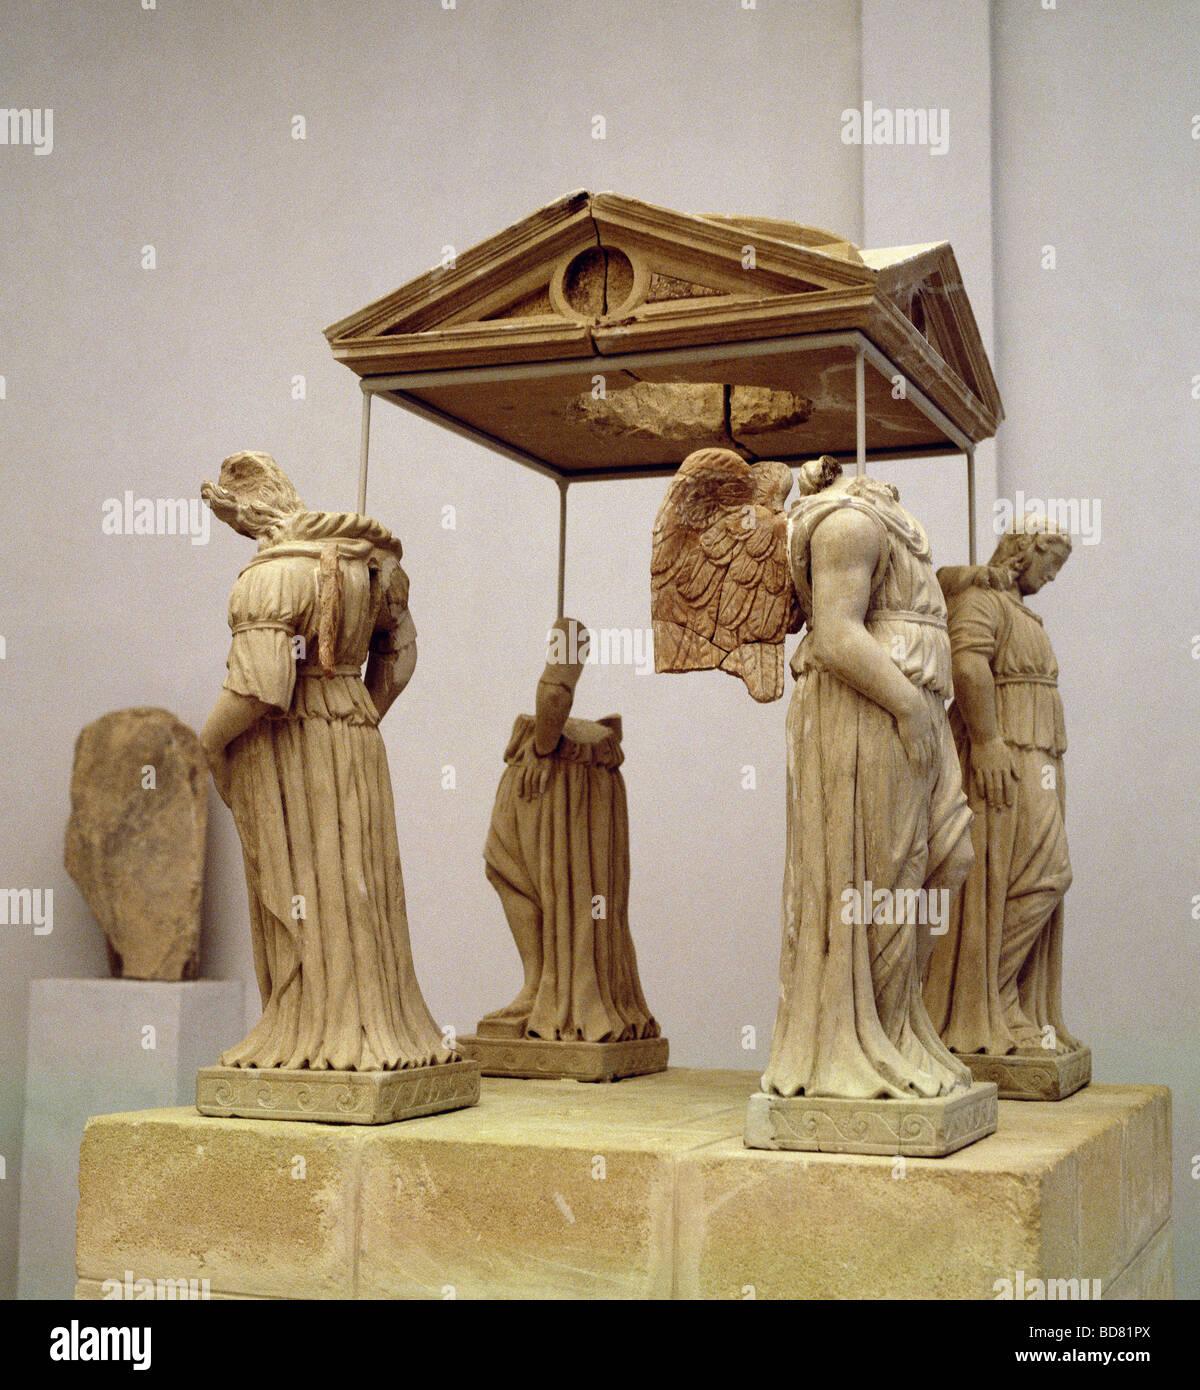 an art analysis of an ancient greek gravestone Art & artifacts of ancient greece  greece, ca it functioned as a grave marker for a fallen young warrior named kroîsos  art history formal analysis .